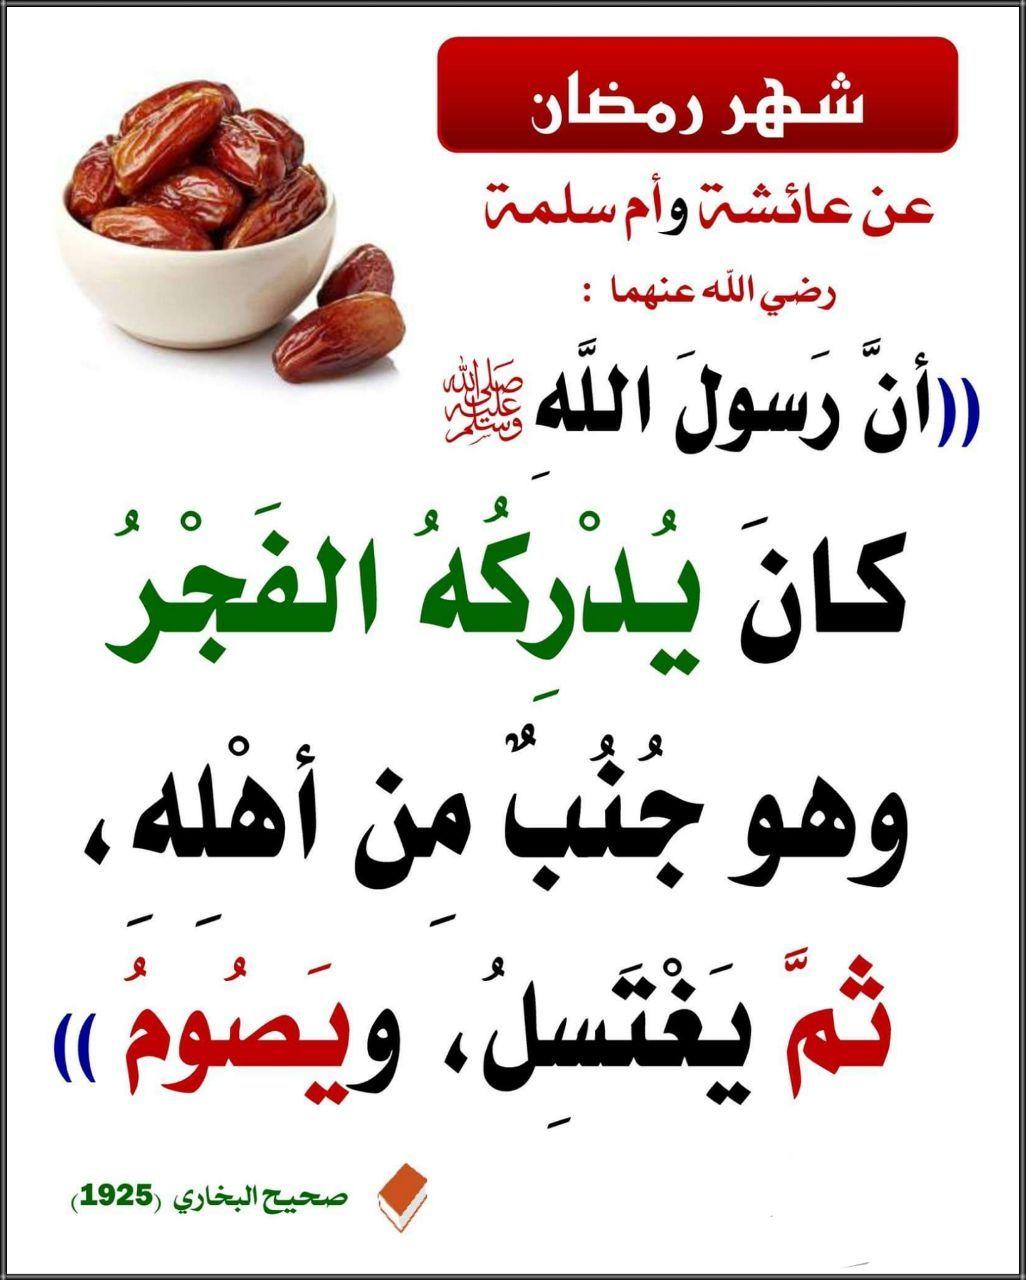 Pin By Karhi On شهر رمضان Islam Islam Quran Ramadan